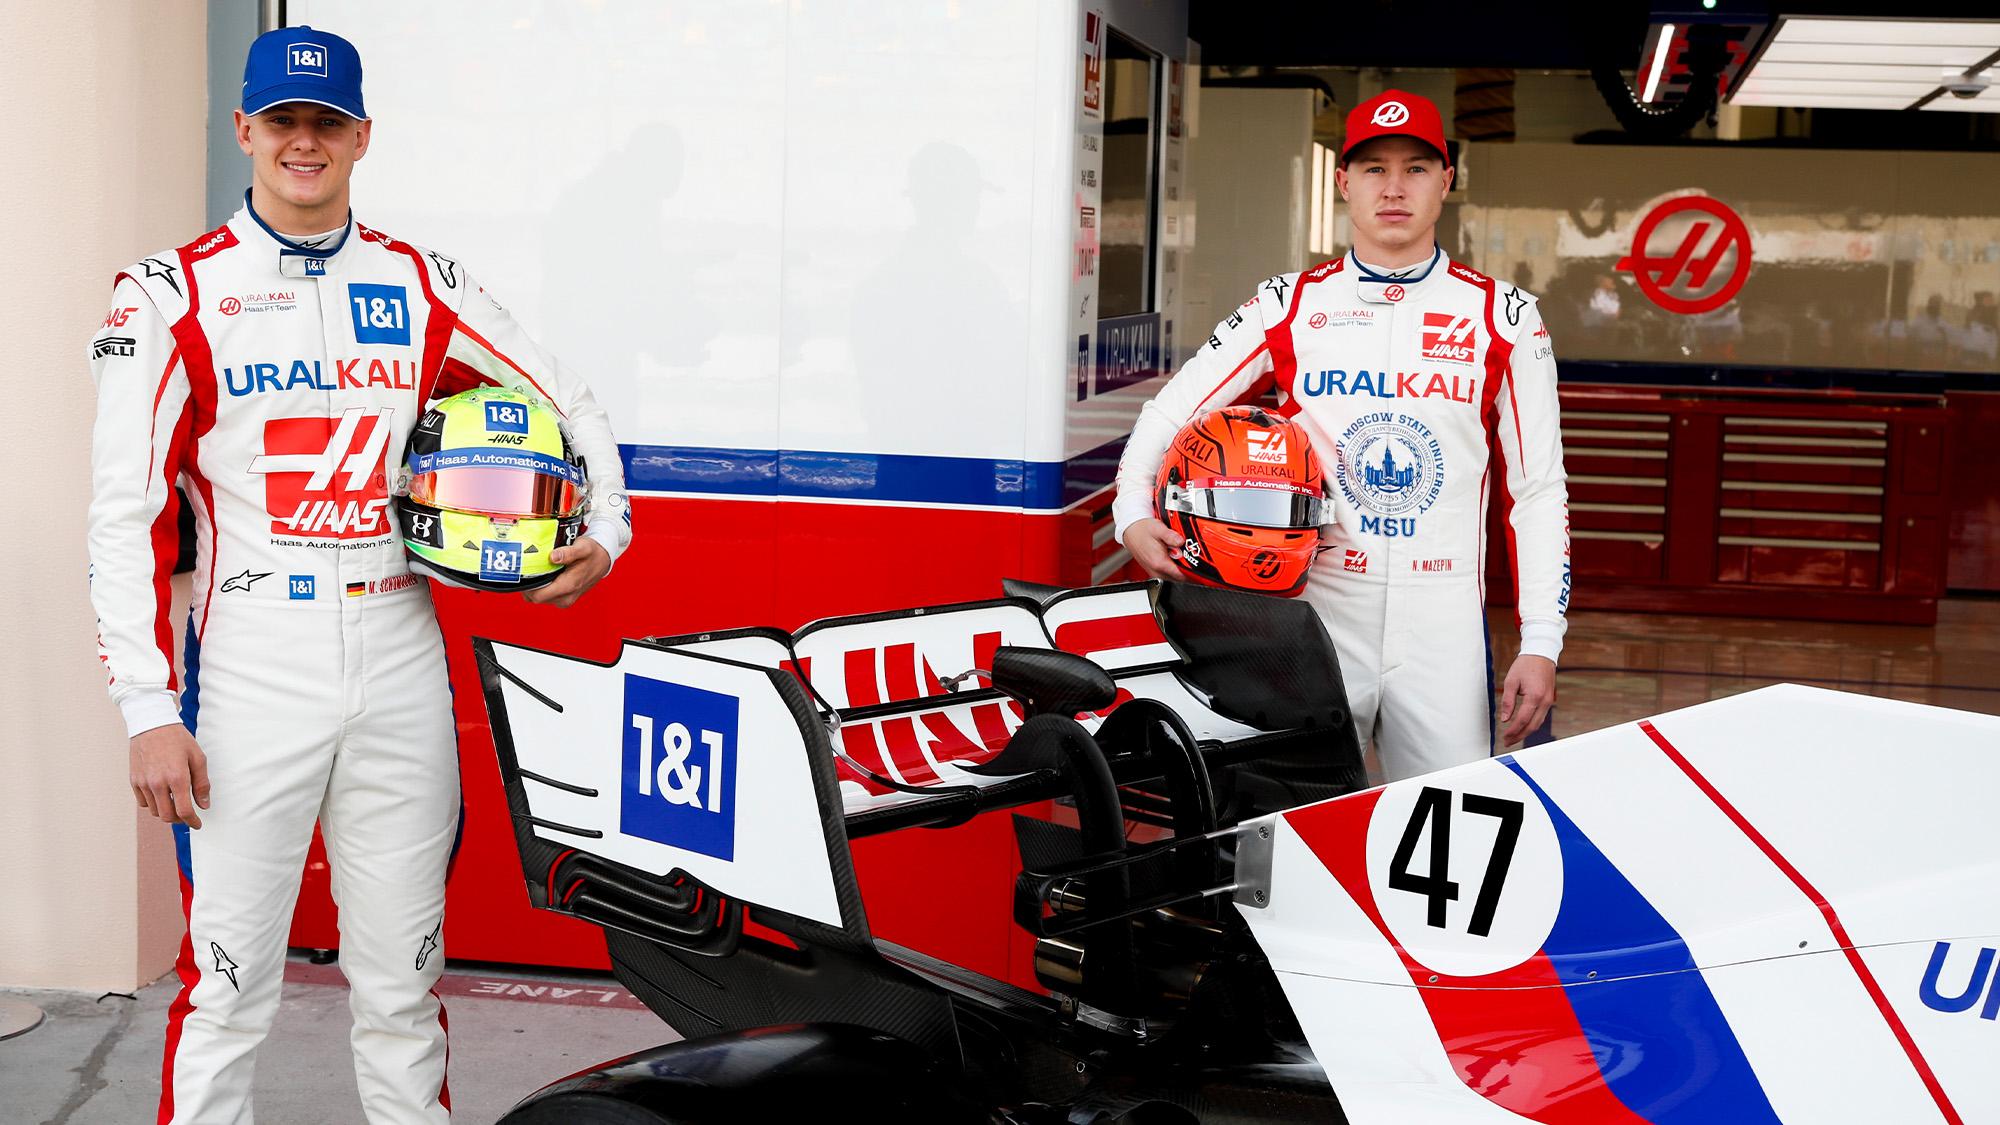 Mick Schumacher and Nikita Mazepin ahead of the 2021 F1 season